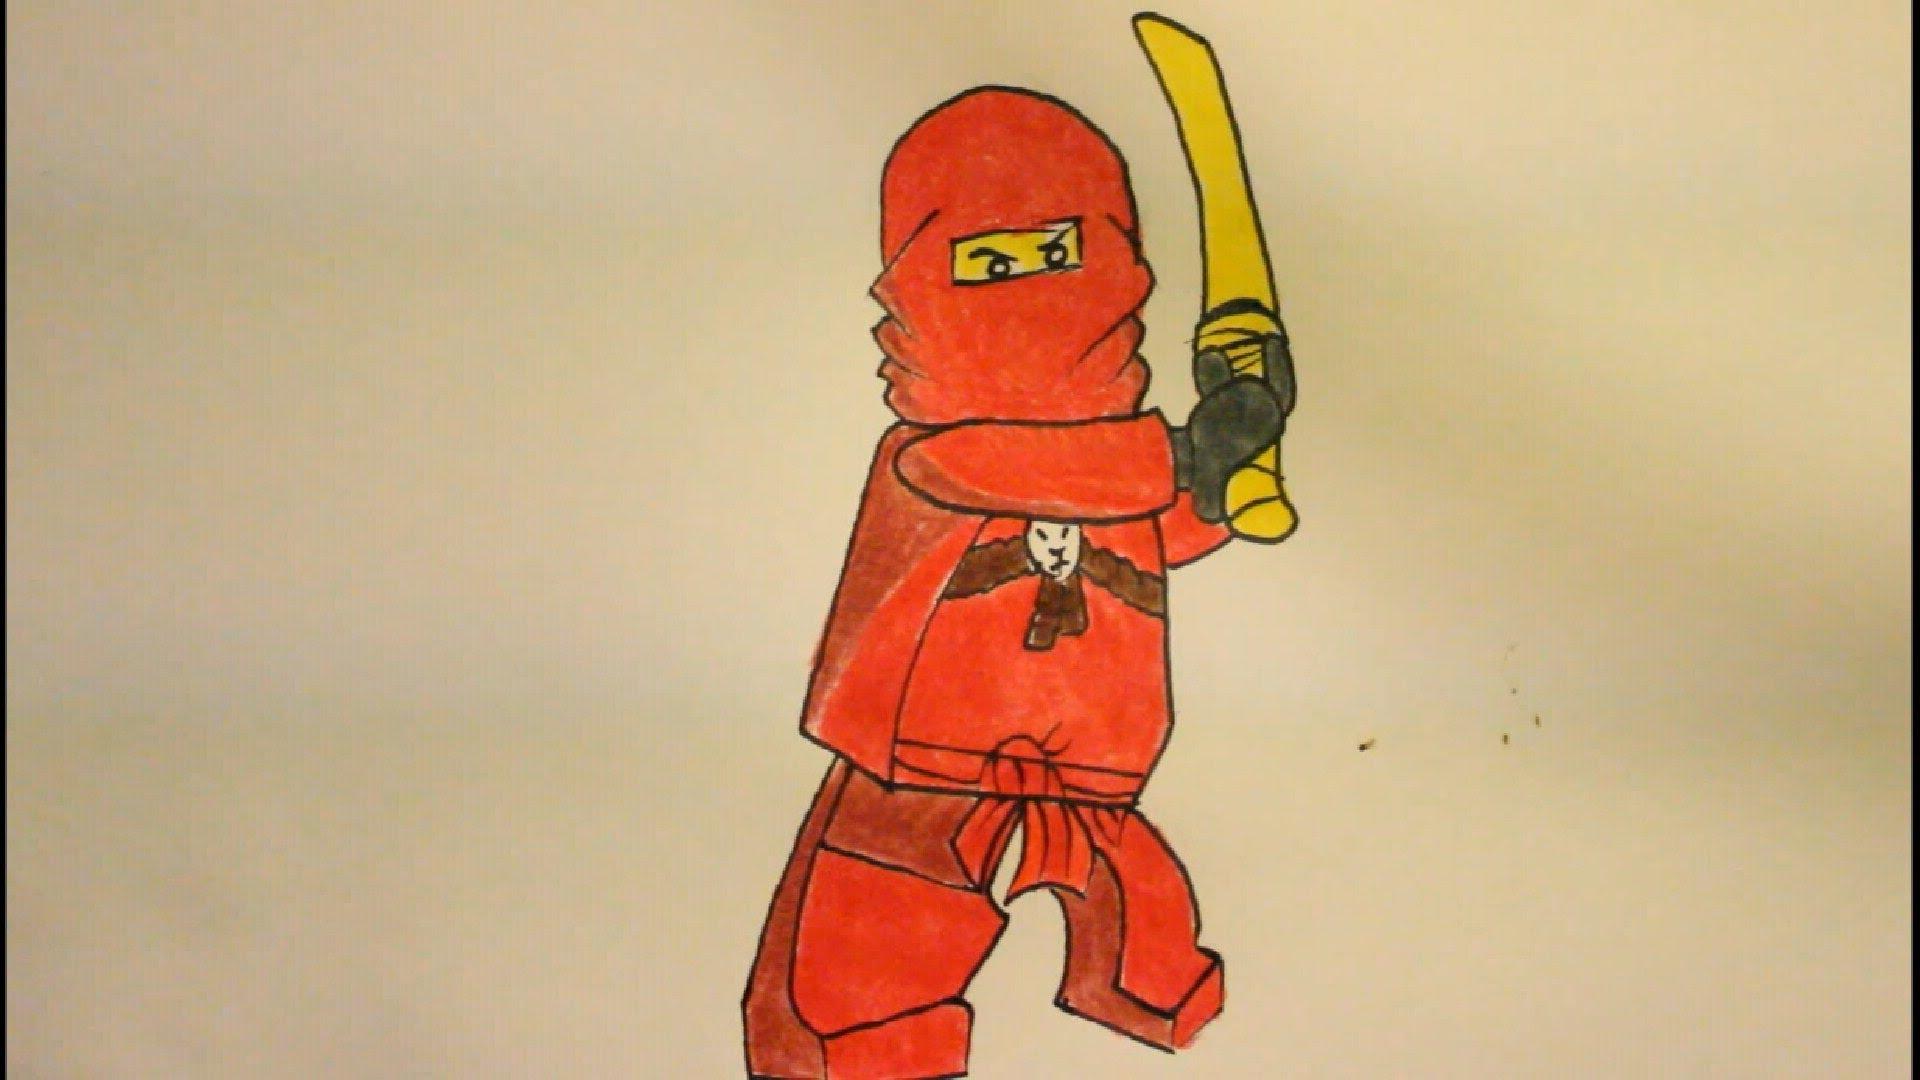 Drawn amd ninjago From Step Draw YouTube By